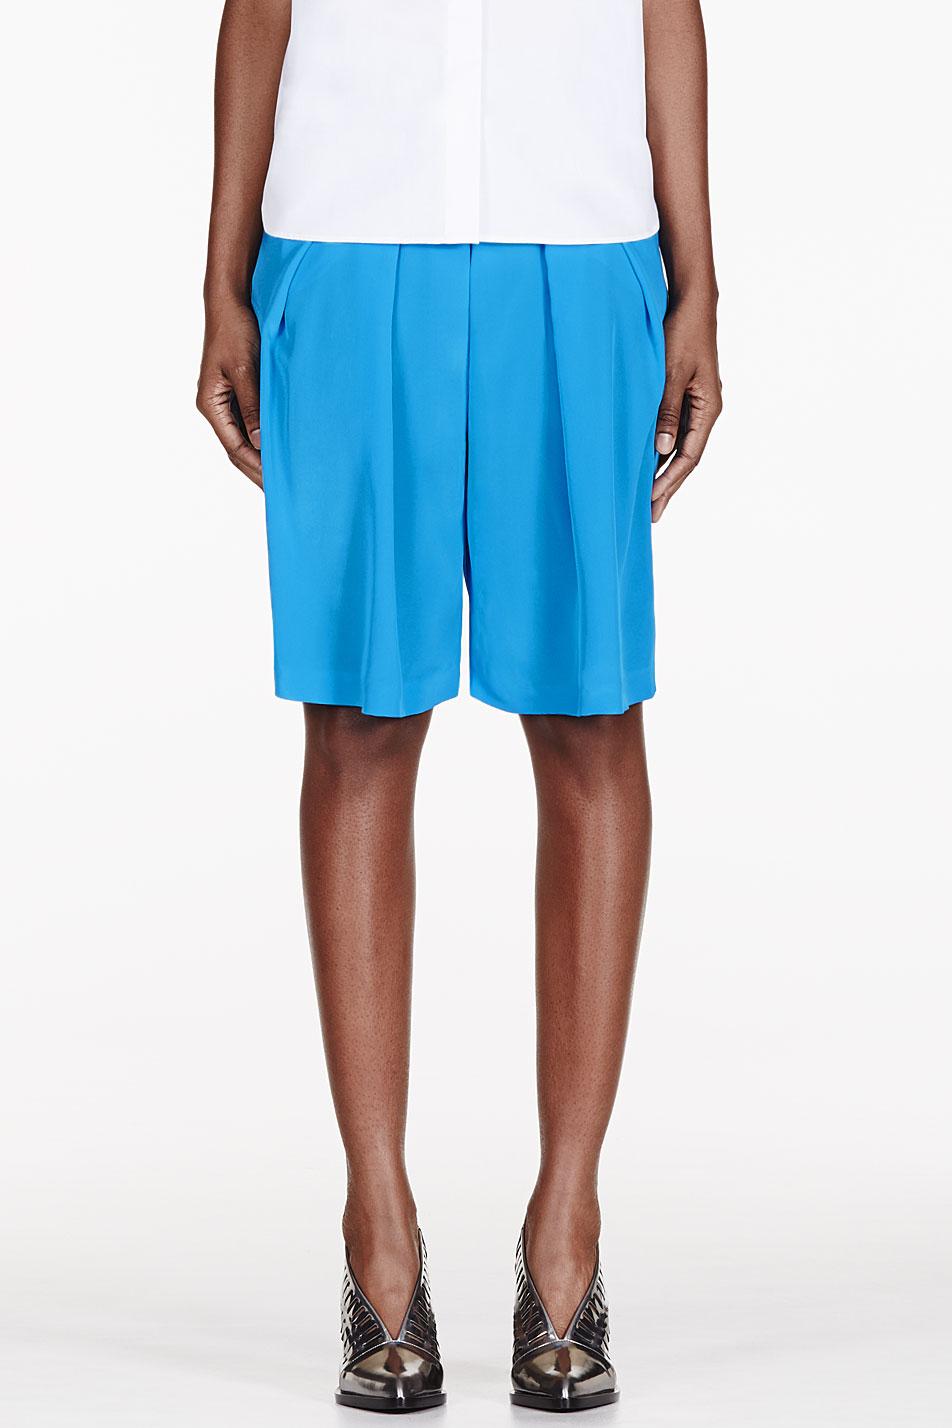 altuzarra blue pleated poet shorts